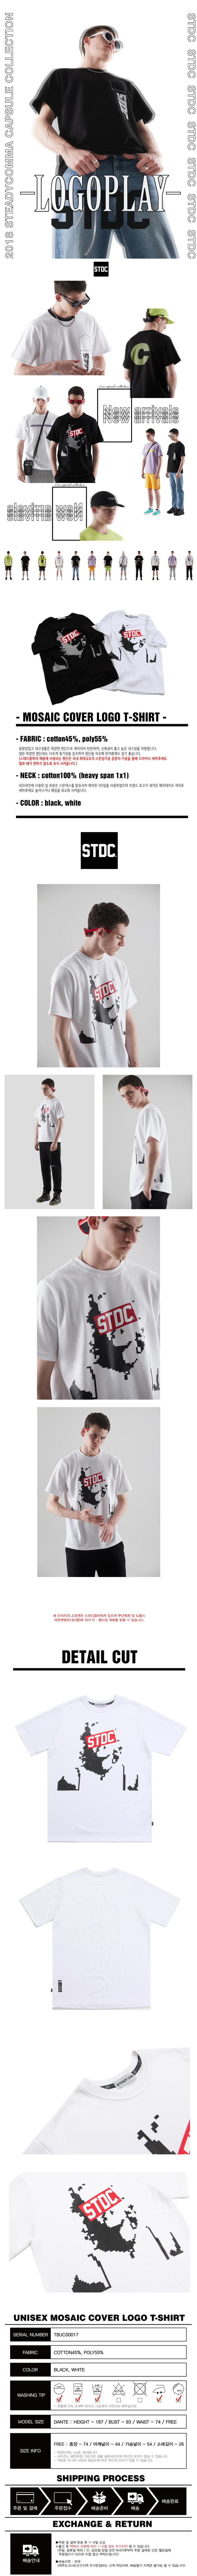 MOSAIC COVER LOGO T-SHIRTS WHITE.jpg